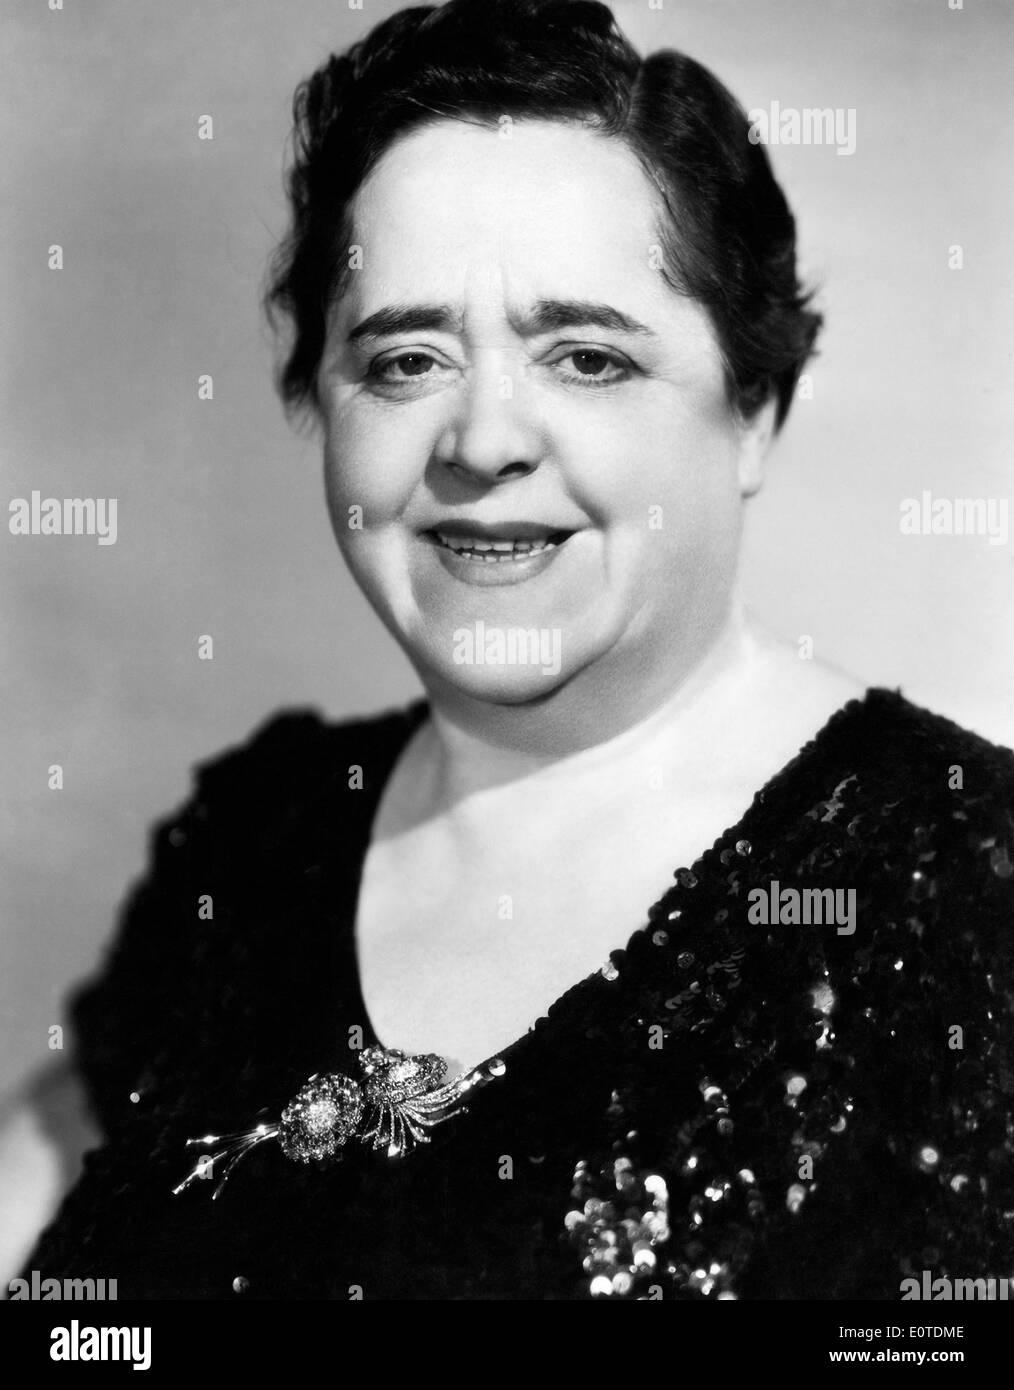 Elsa Maxwell, American Gossip Columnist and Social Hostess, Portrait, 1939 - Stock Image